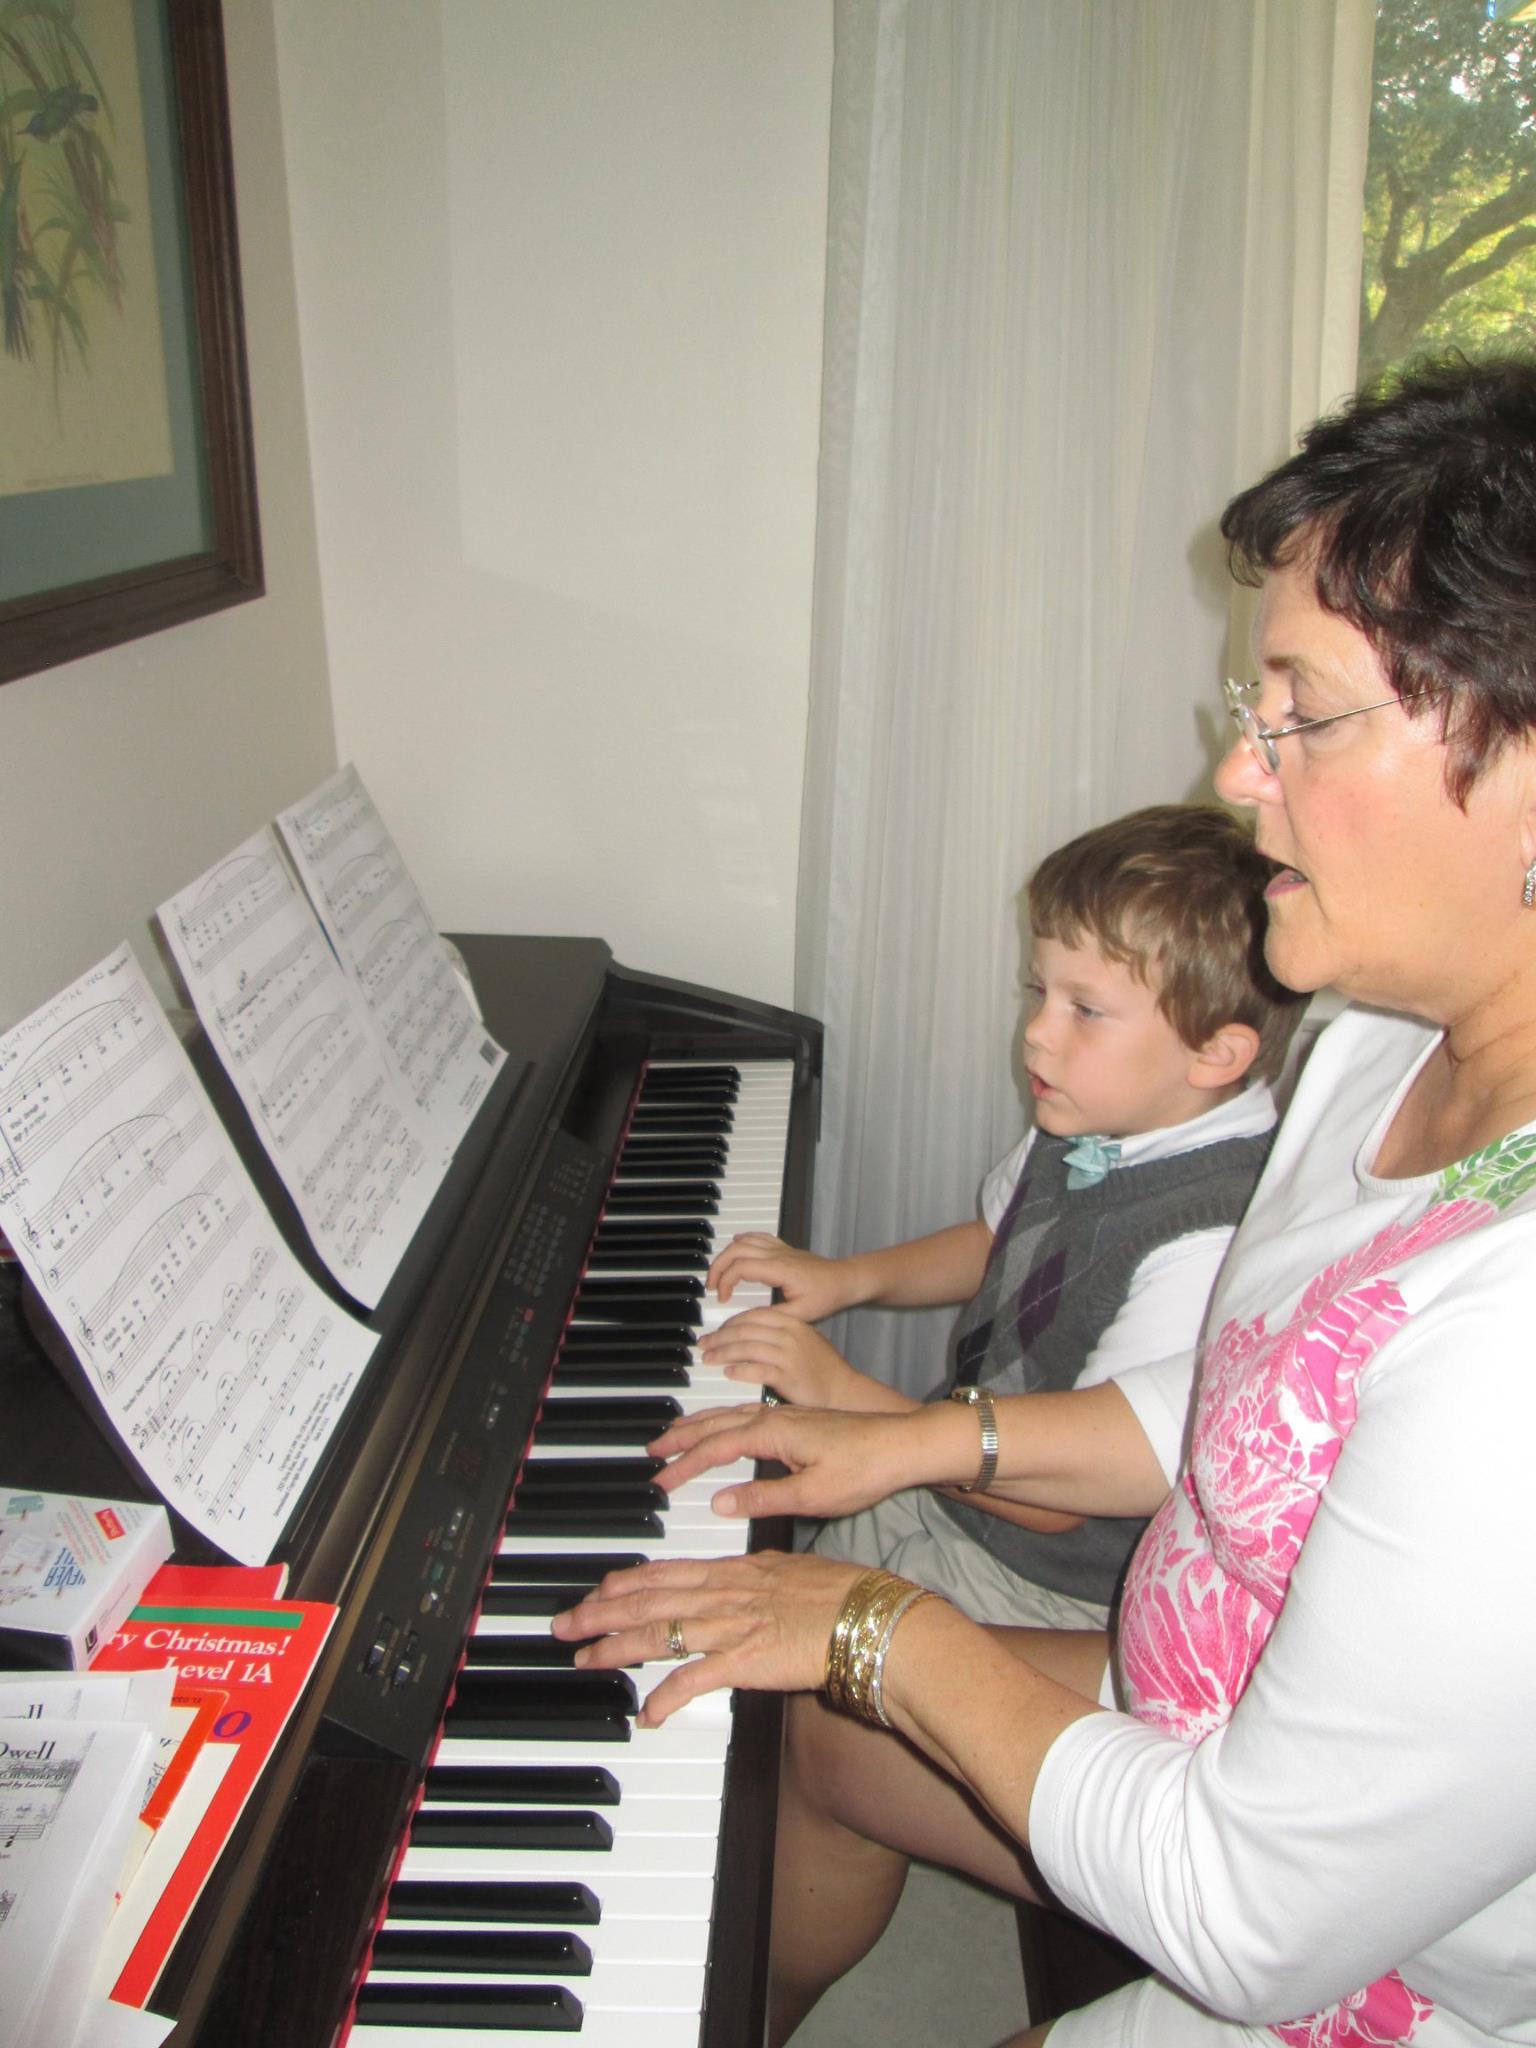 A C piano duet